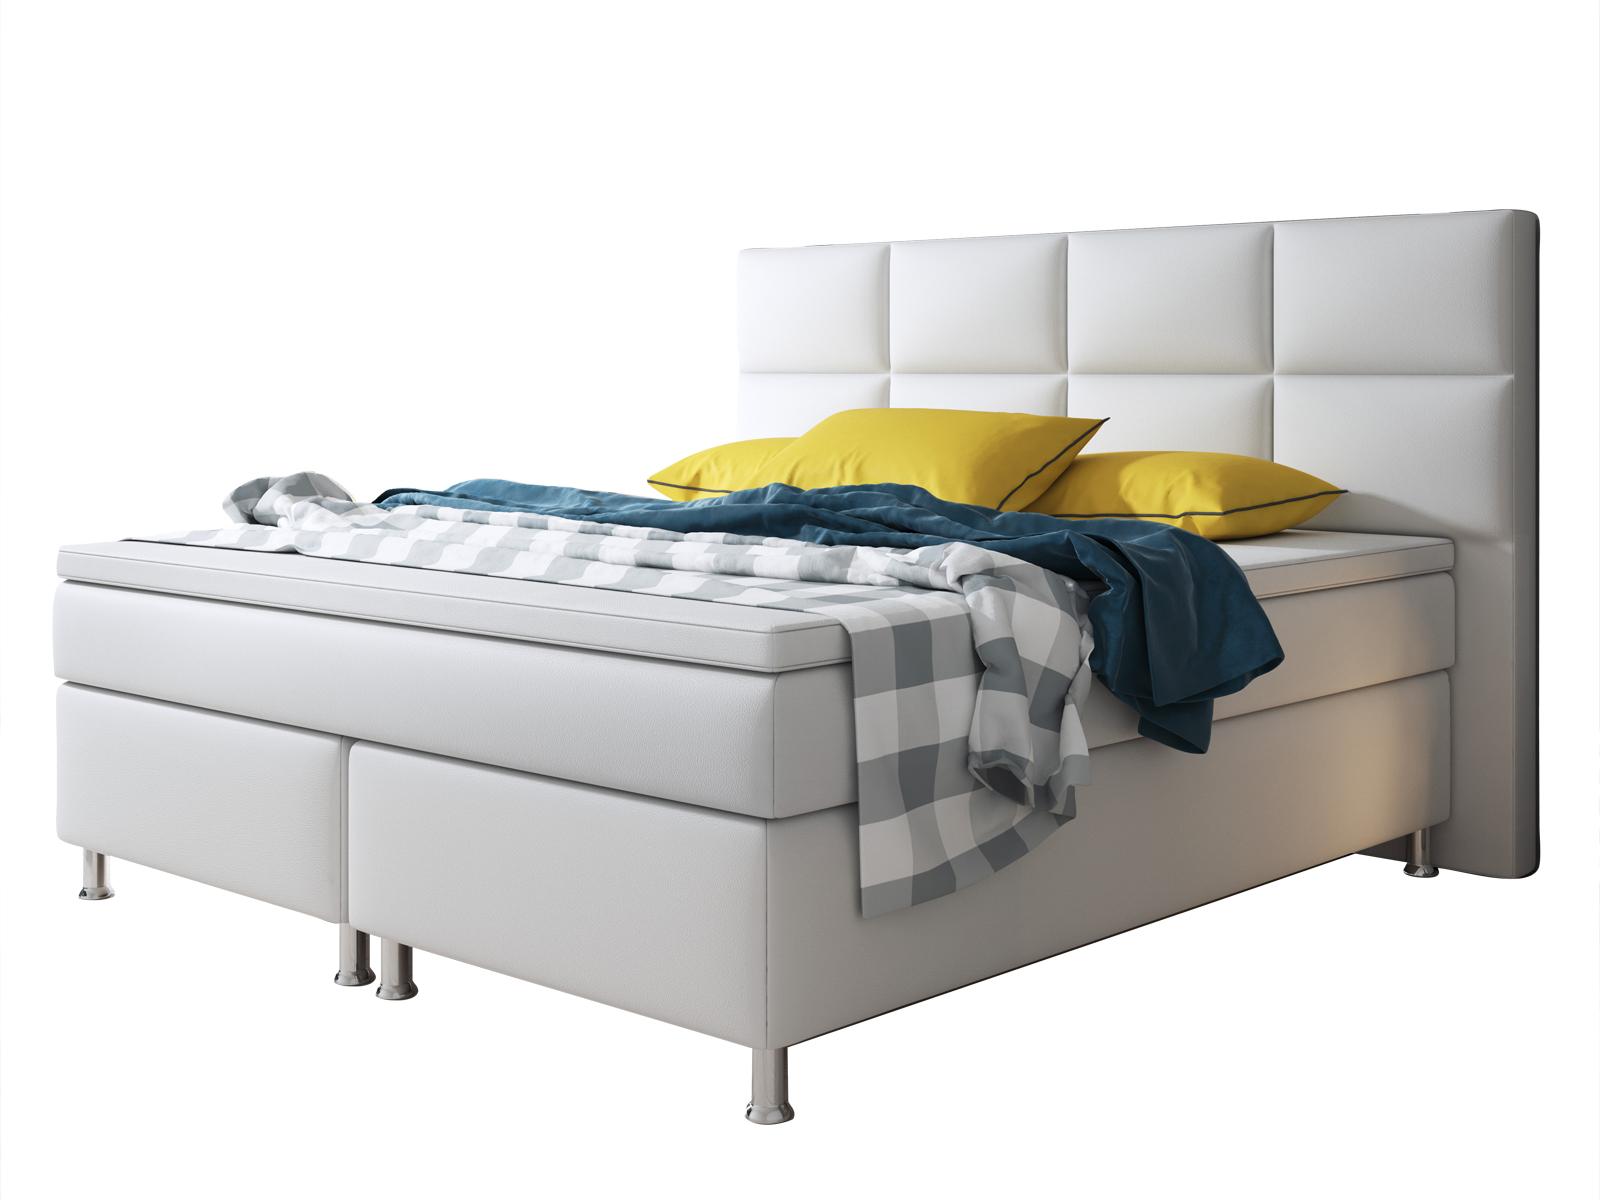 boxspringbett miami 180x200 cm kunstleder wei schlafen. Black Bedroom Furniture Sets. Home Design Ideas